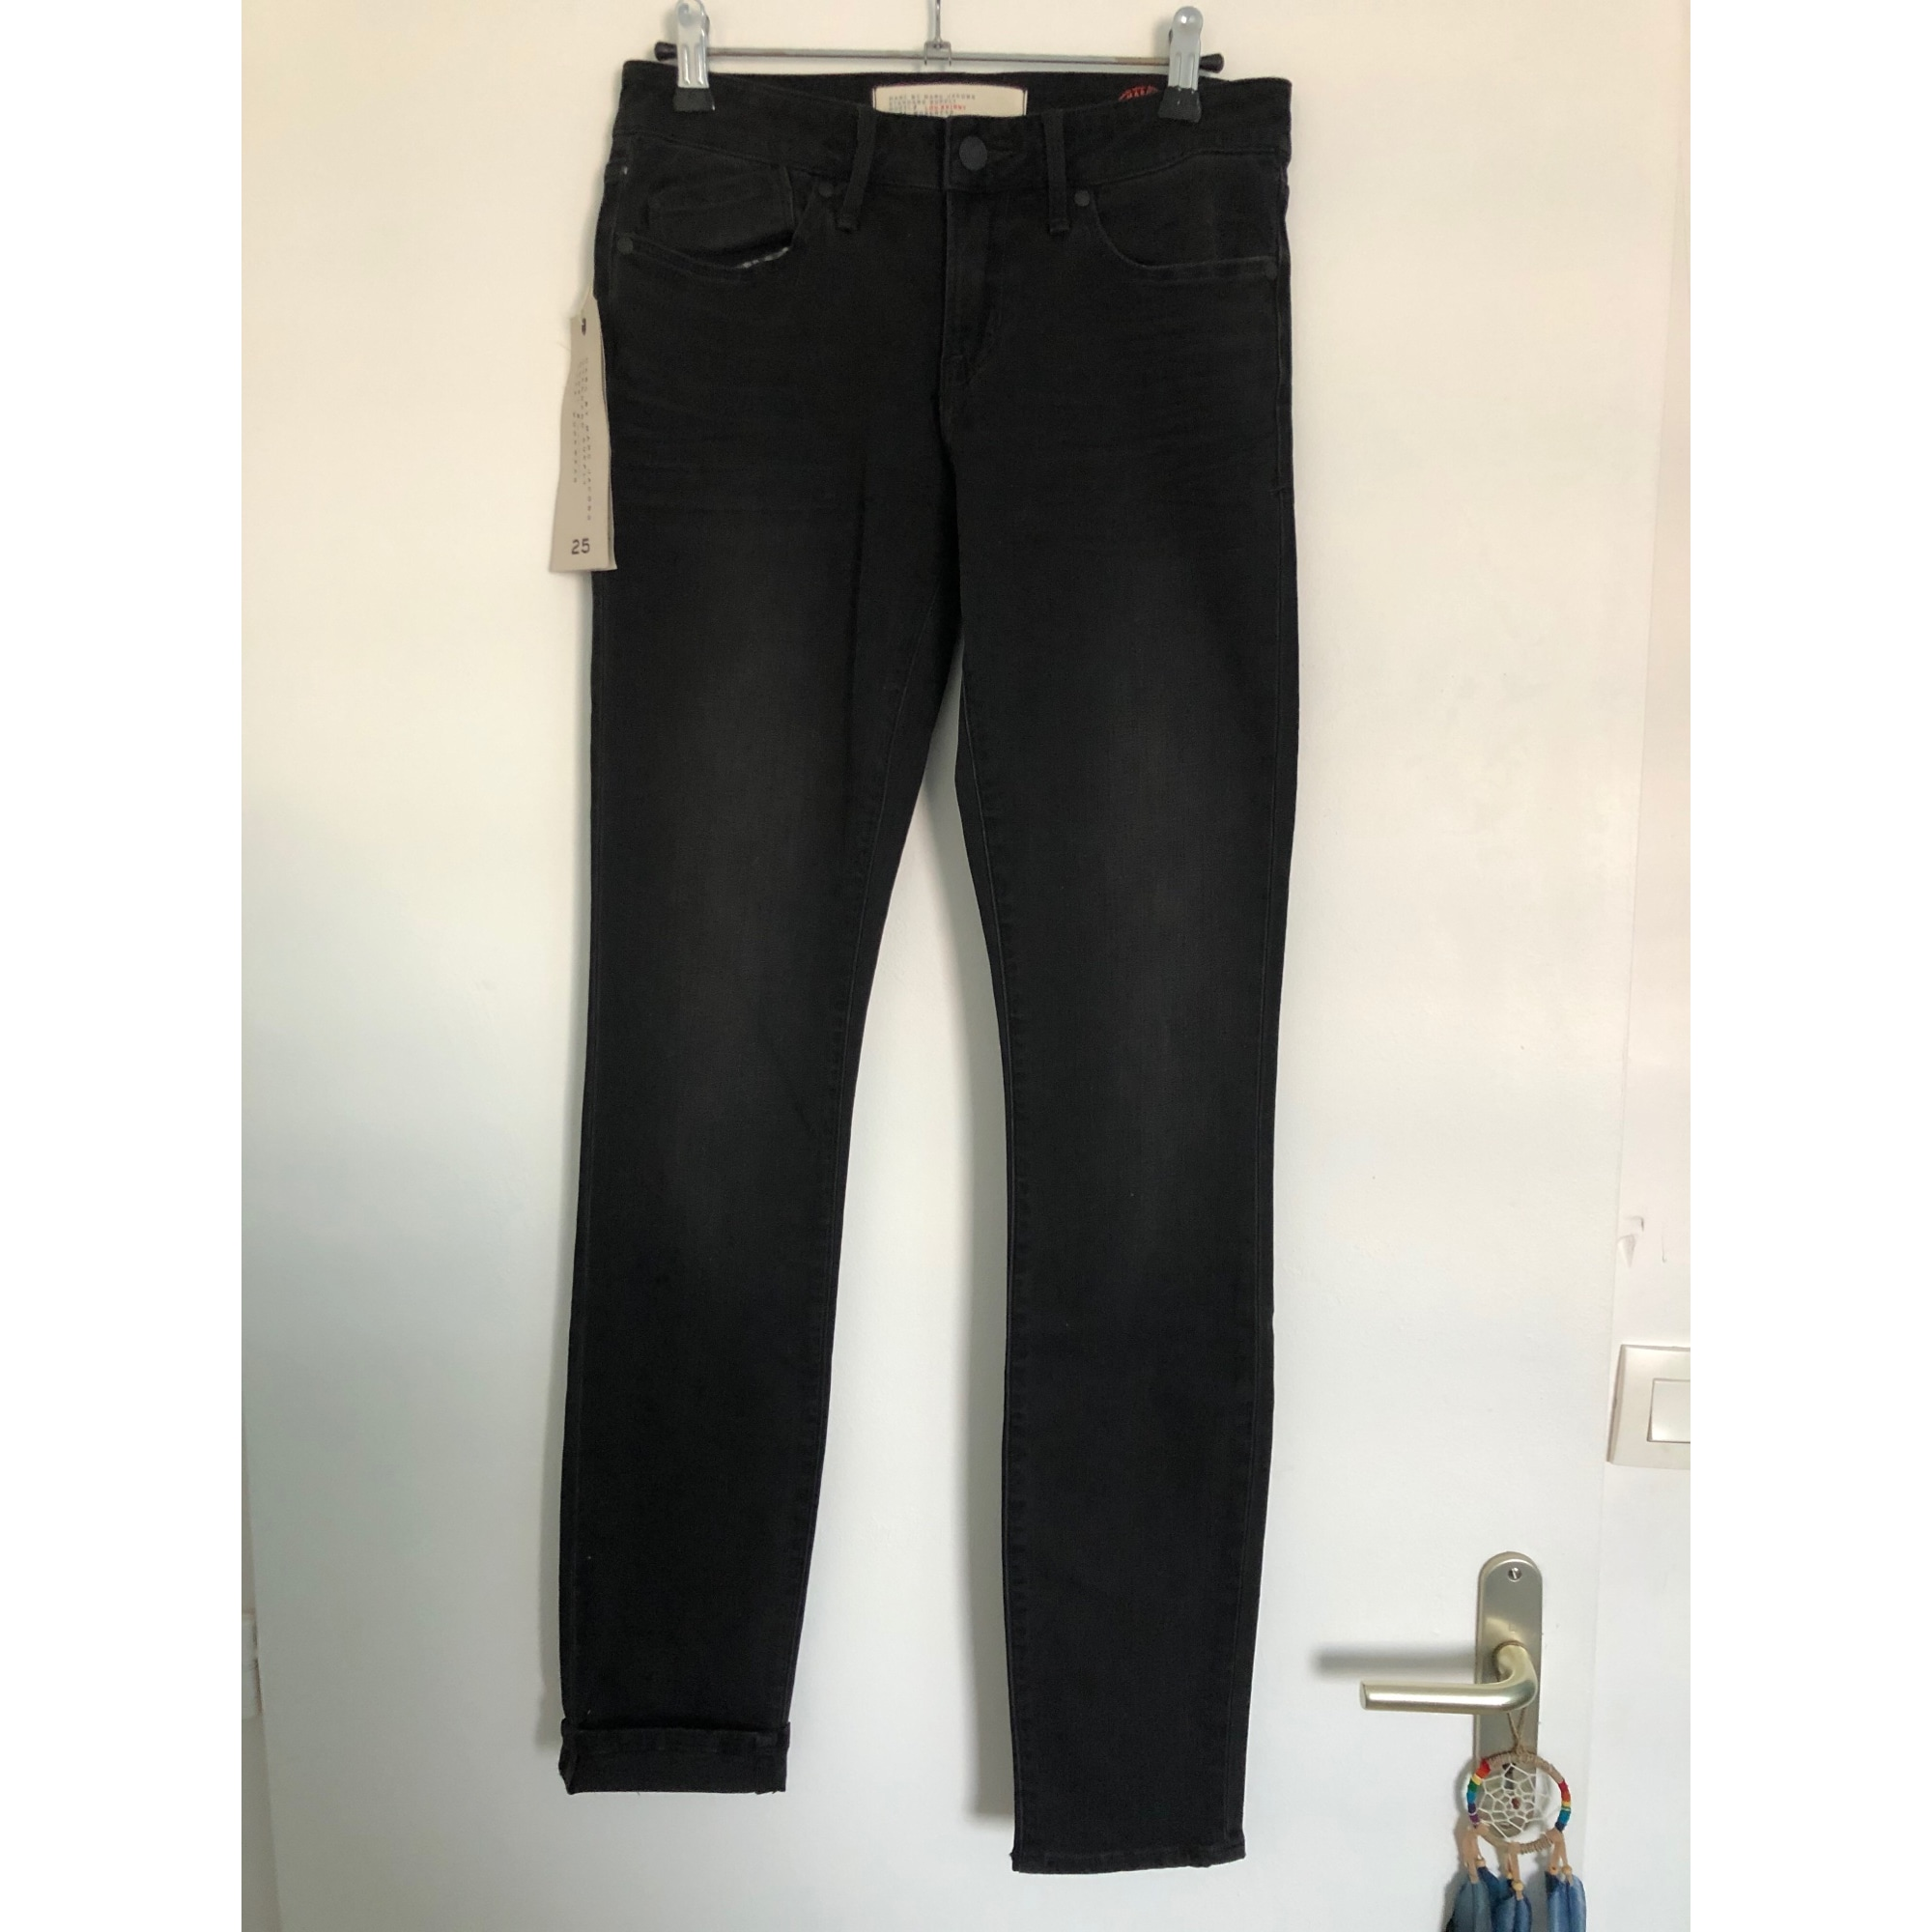 Jeans slim MARC JACOBS Gris, anthracite